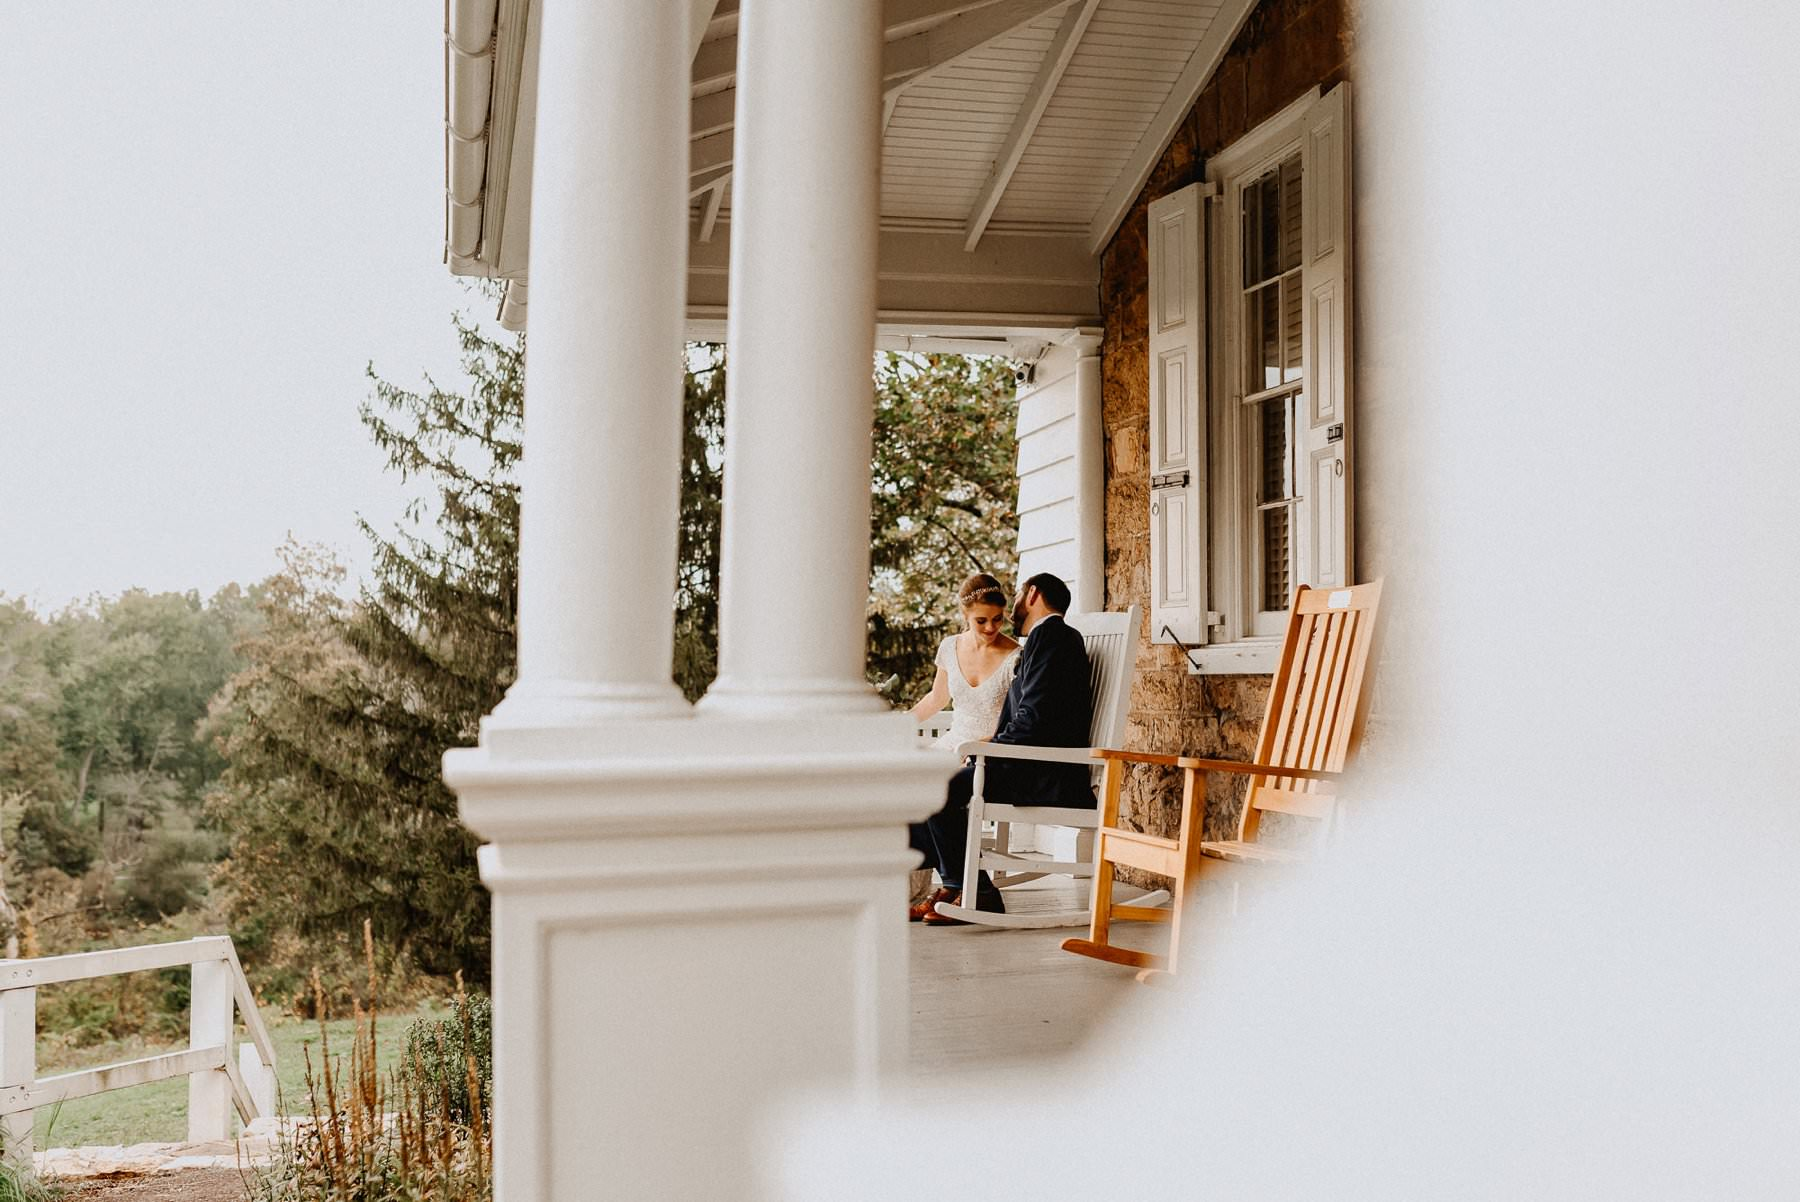 John_James_Audubon_Center_wedding-57.jpg